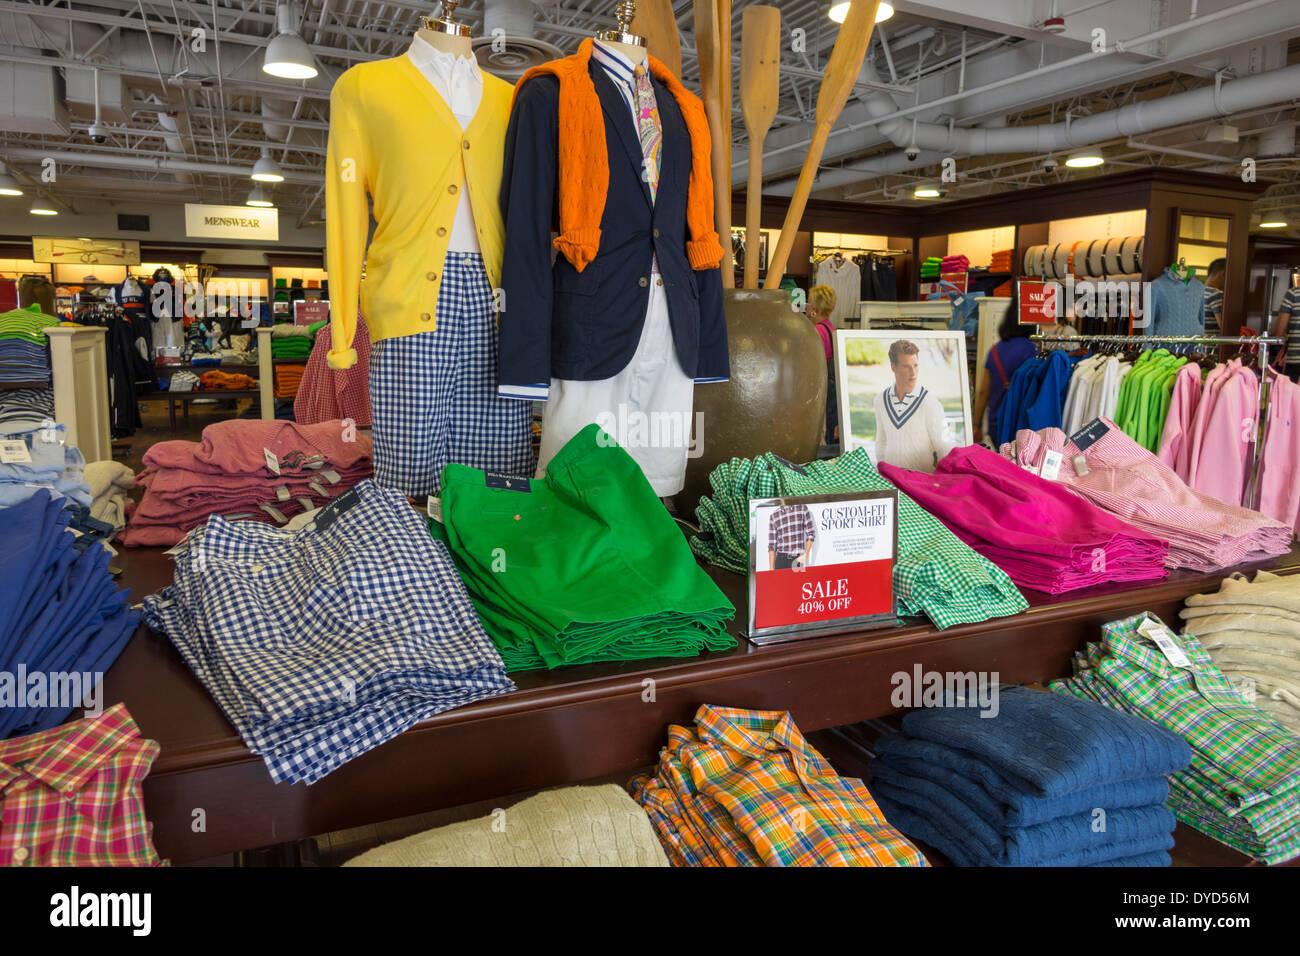 Orlando Florida Orlando Premium Outlets International Drive shopping Polo Ralph  Lauren Outlet in innere Bekleidung Mode 2fca4eecd7